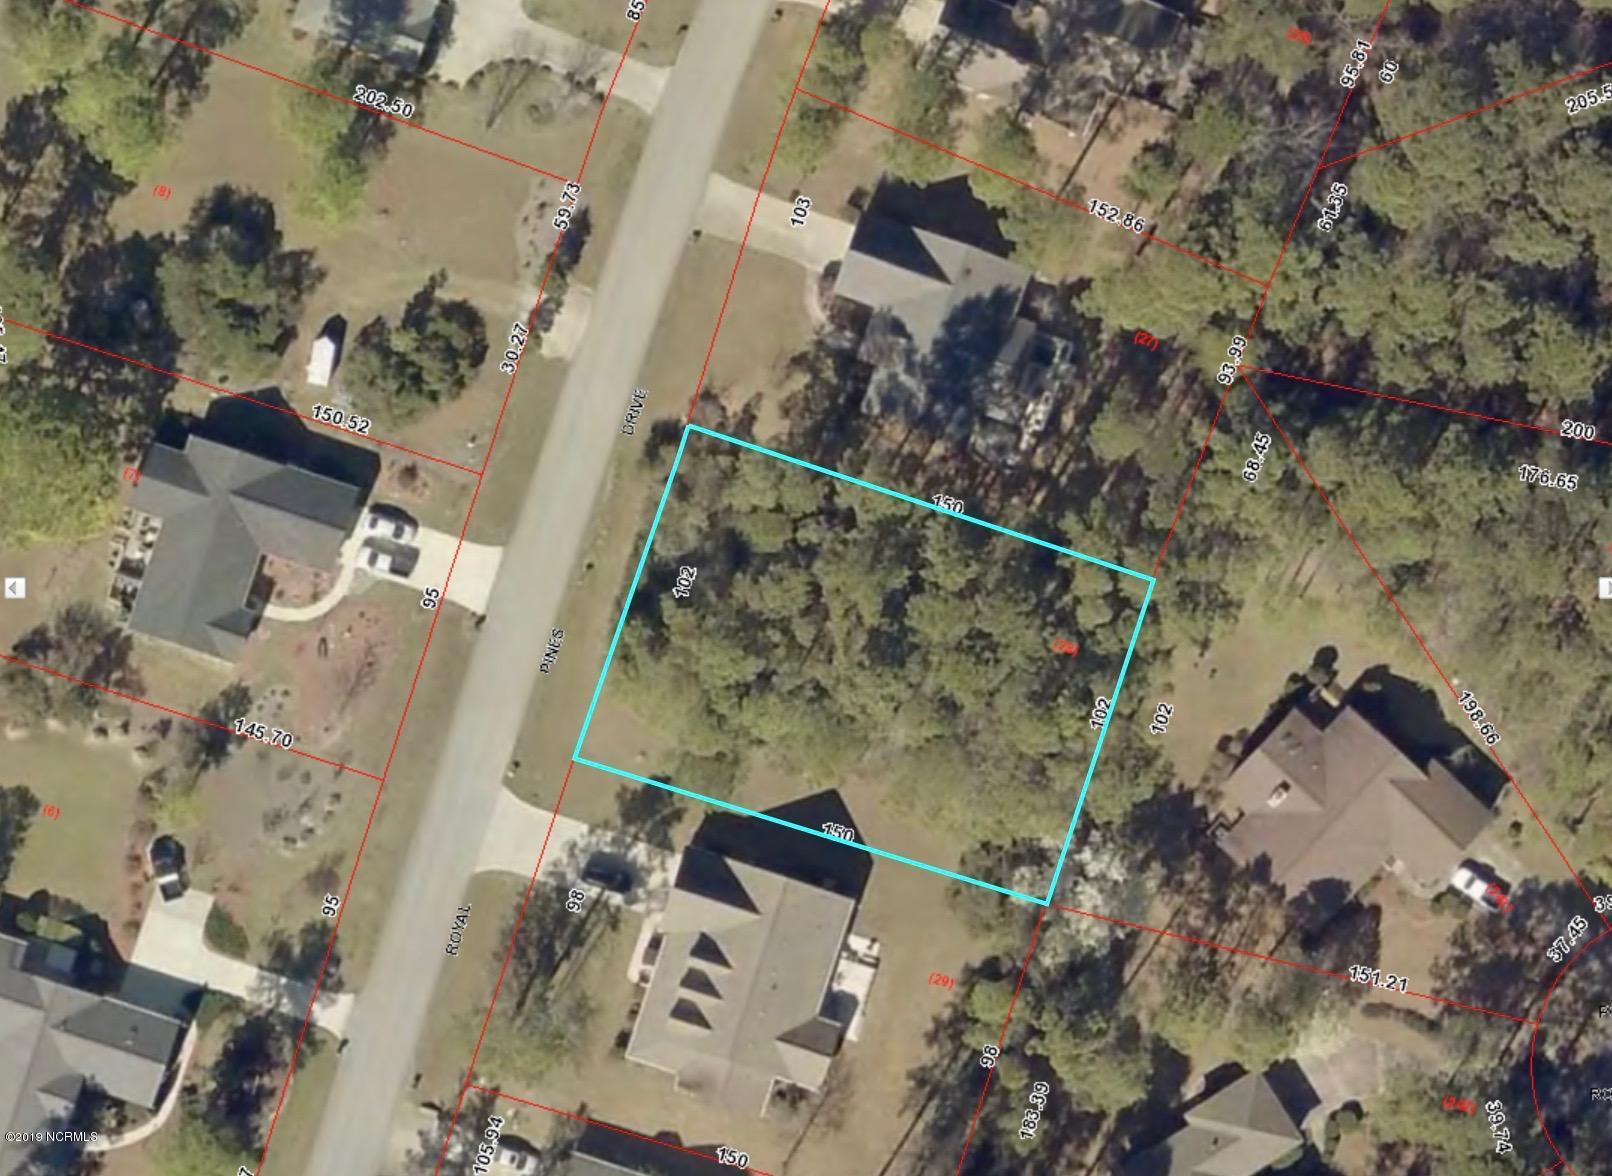 2014 Royal Pines Drive, New Bern, North Carolina 28560, ,Residential land,For sale,Royal Pines,100153276